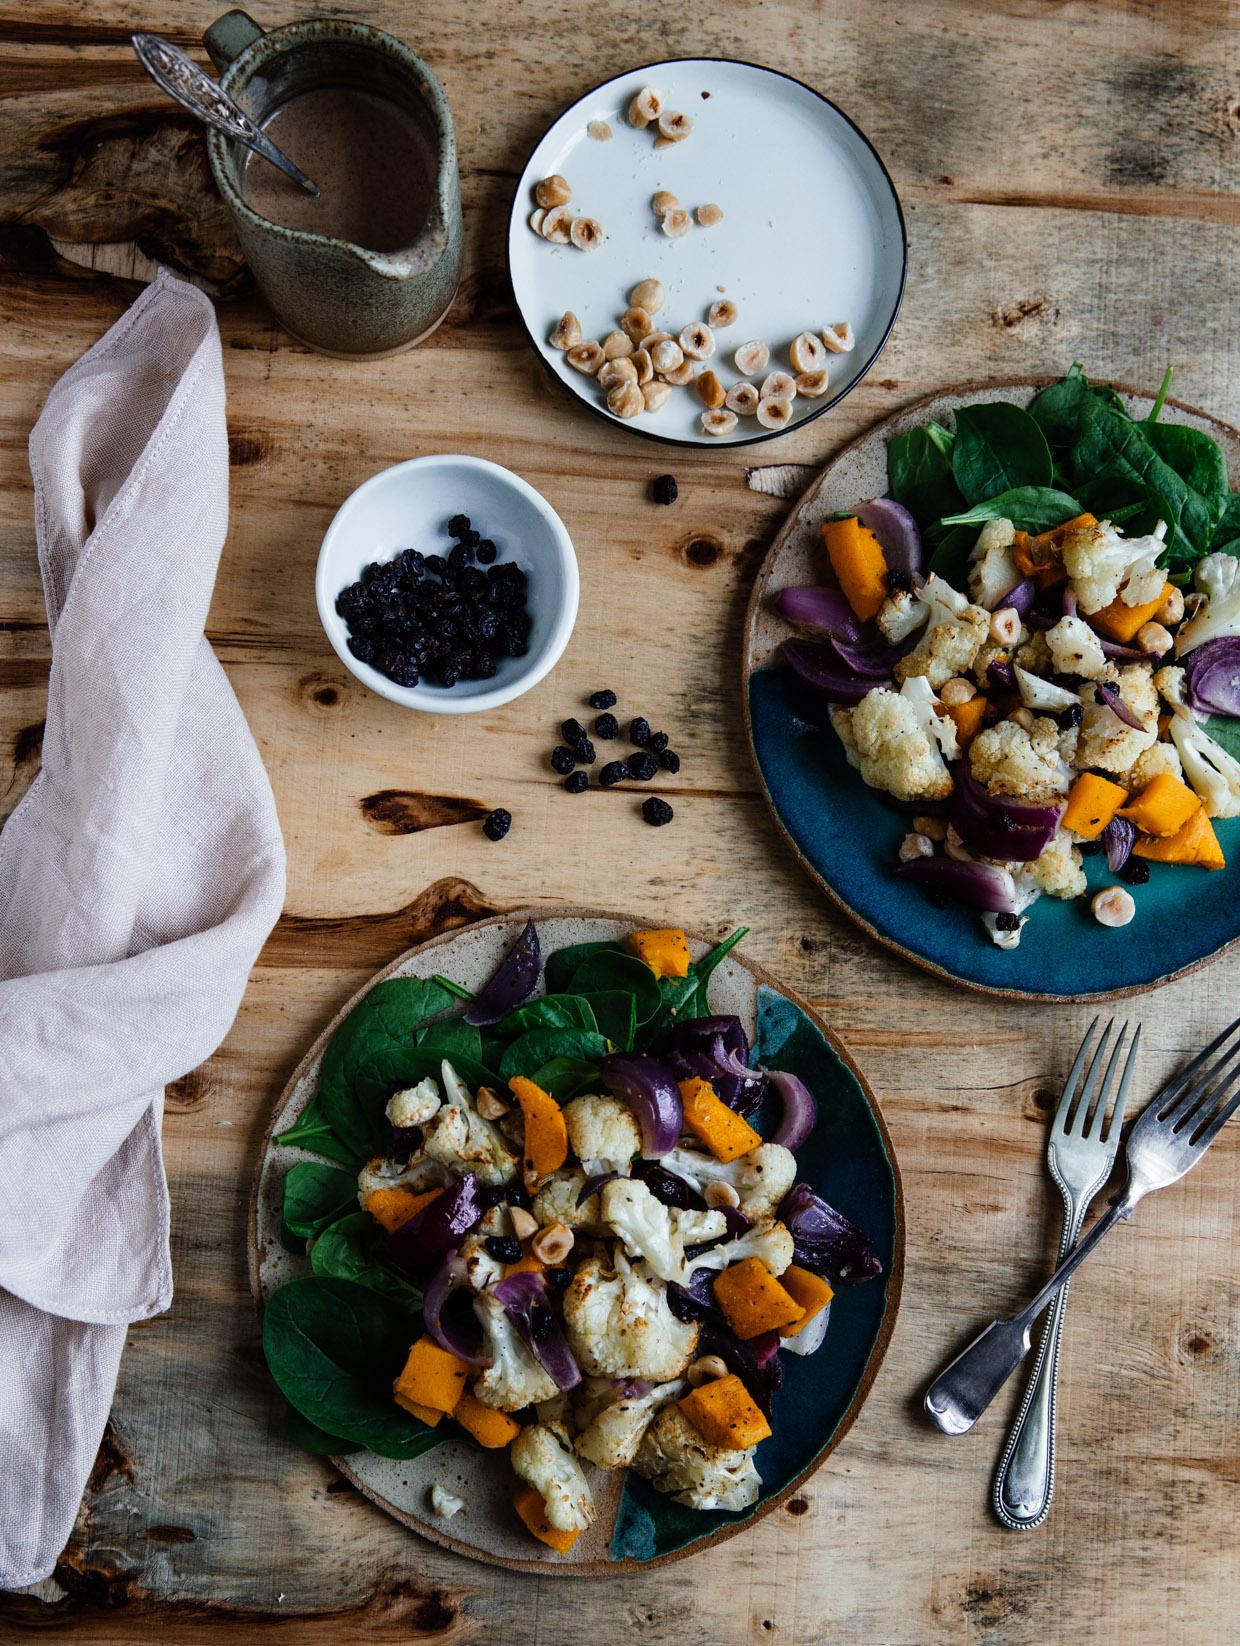 Cauliflower, spinach & hazelnut salad with peanut butter dressing